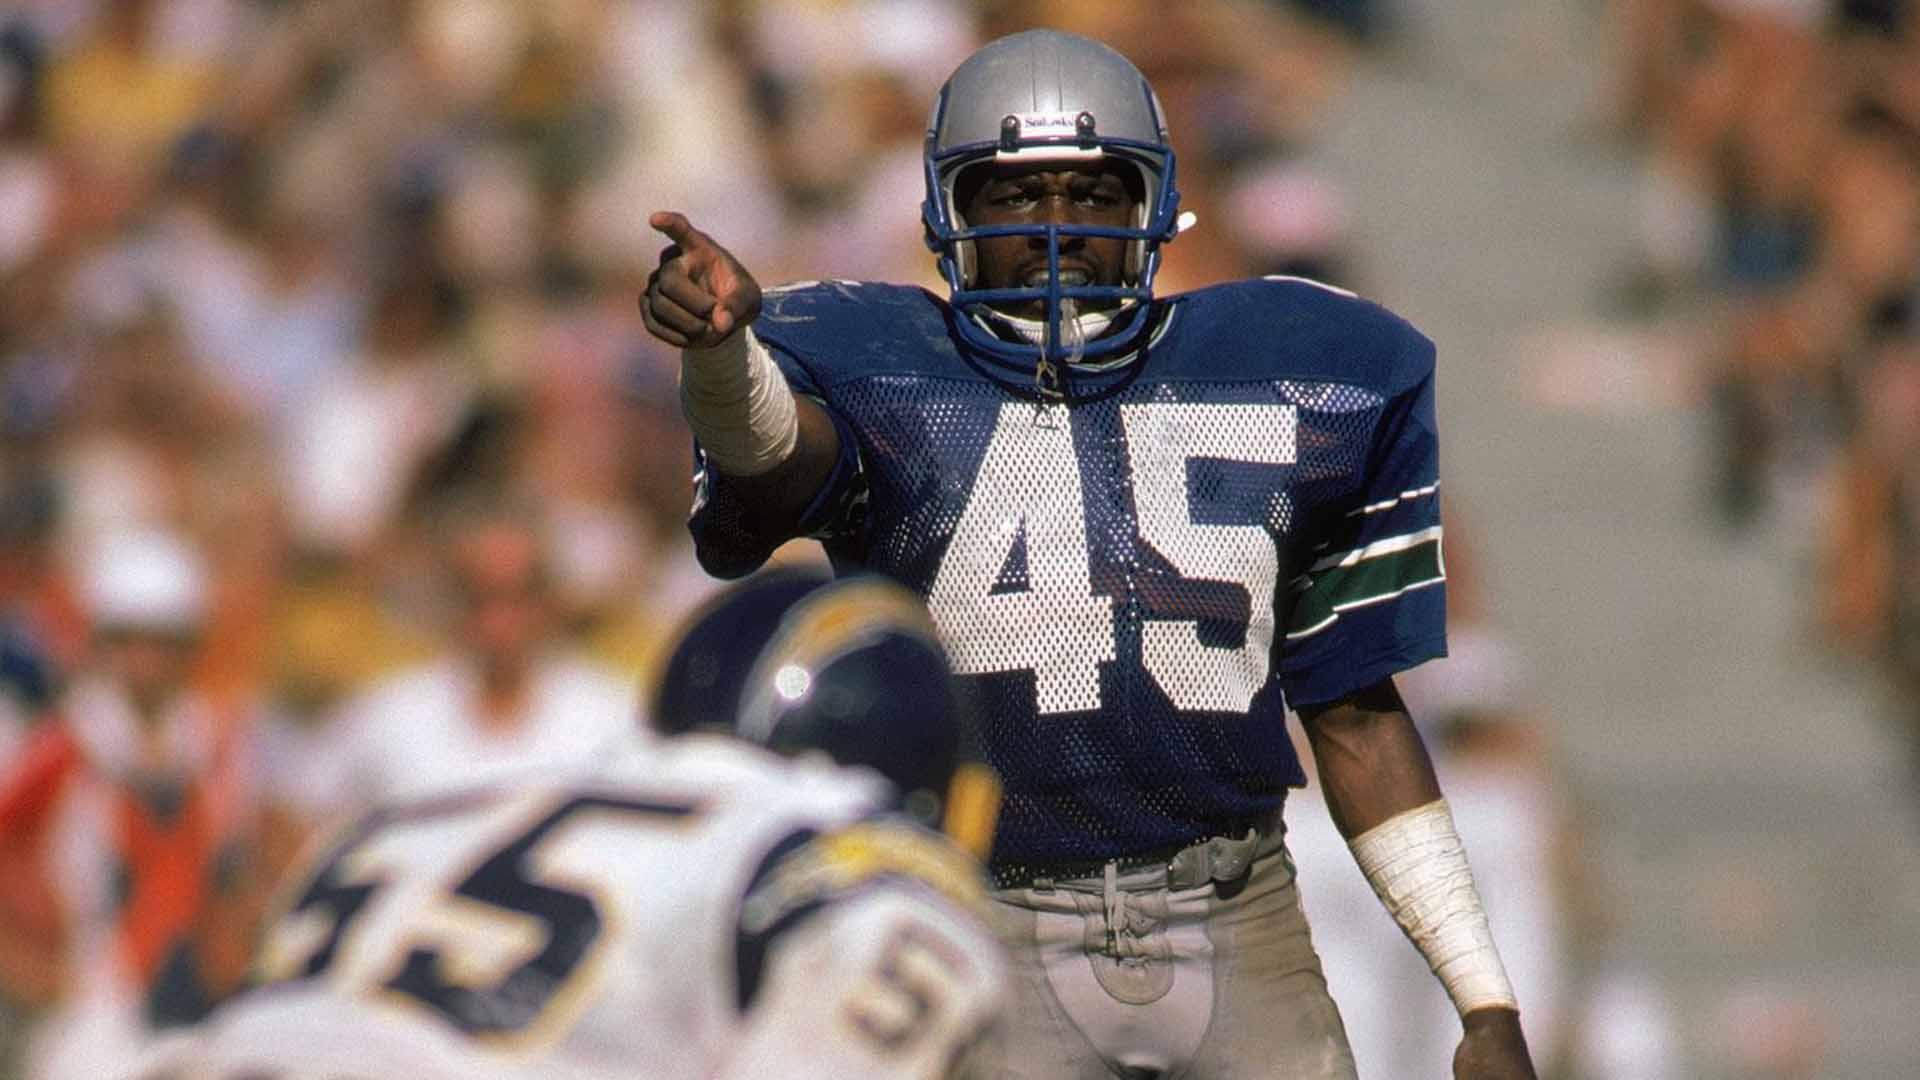 Kenny Easley maiores jogadores do Seattle Seahawks